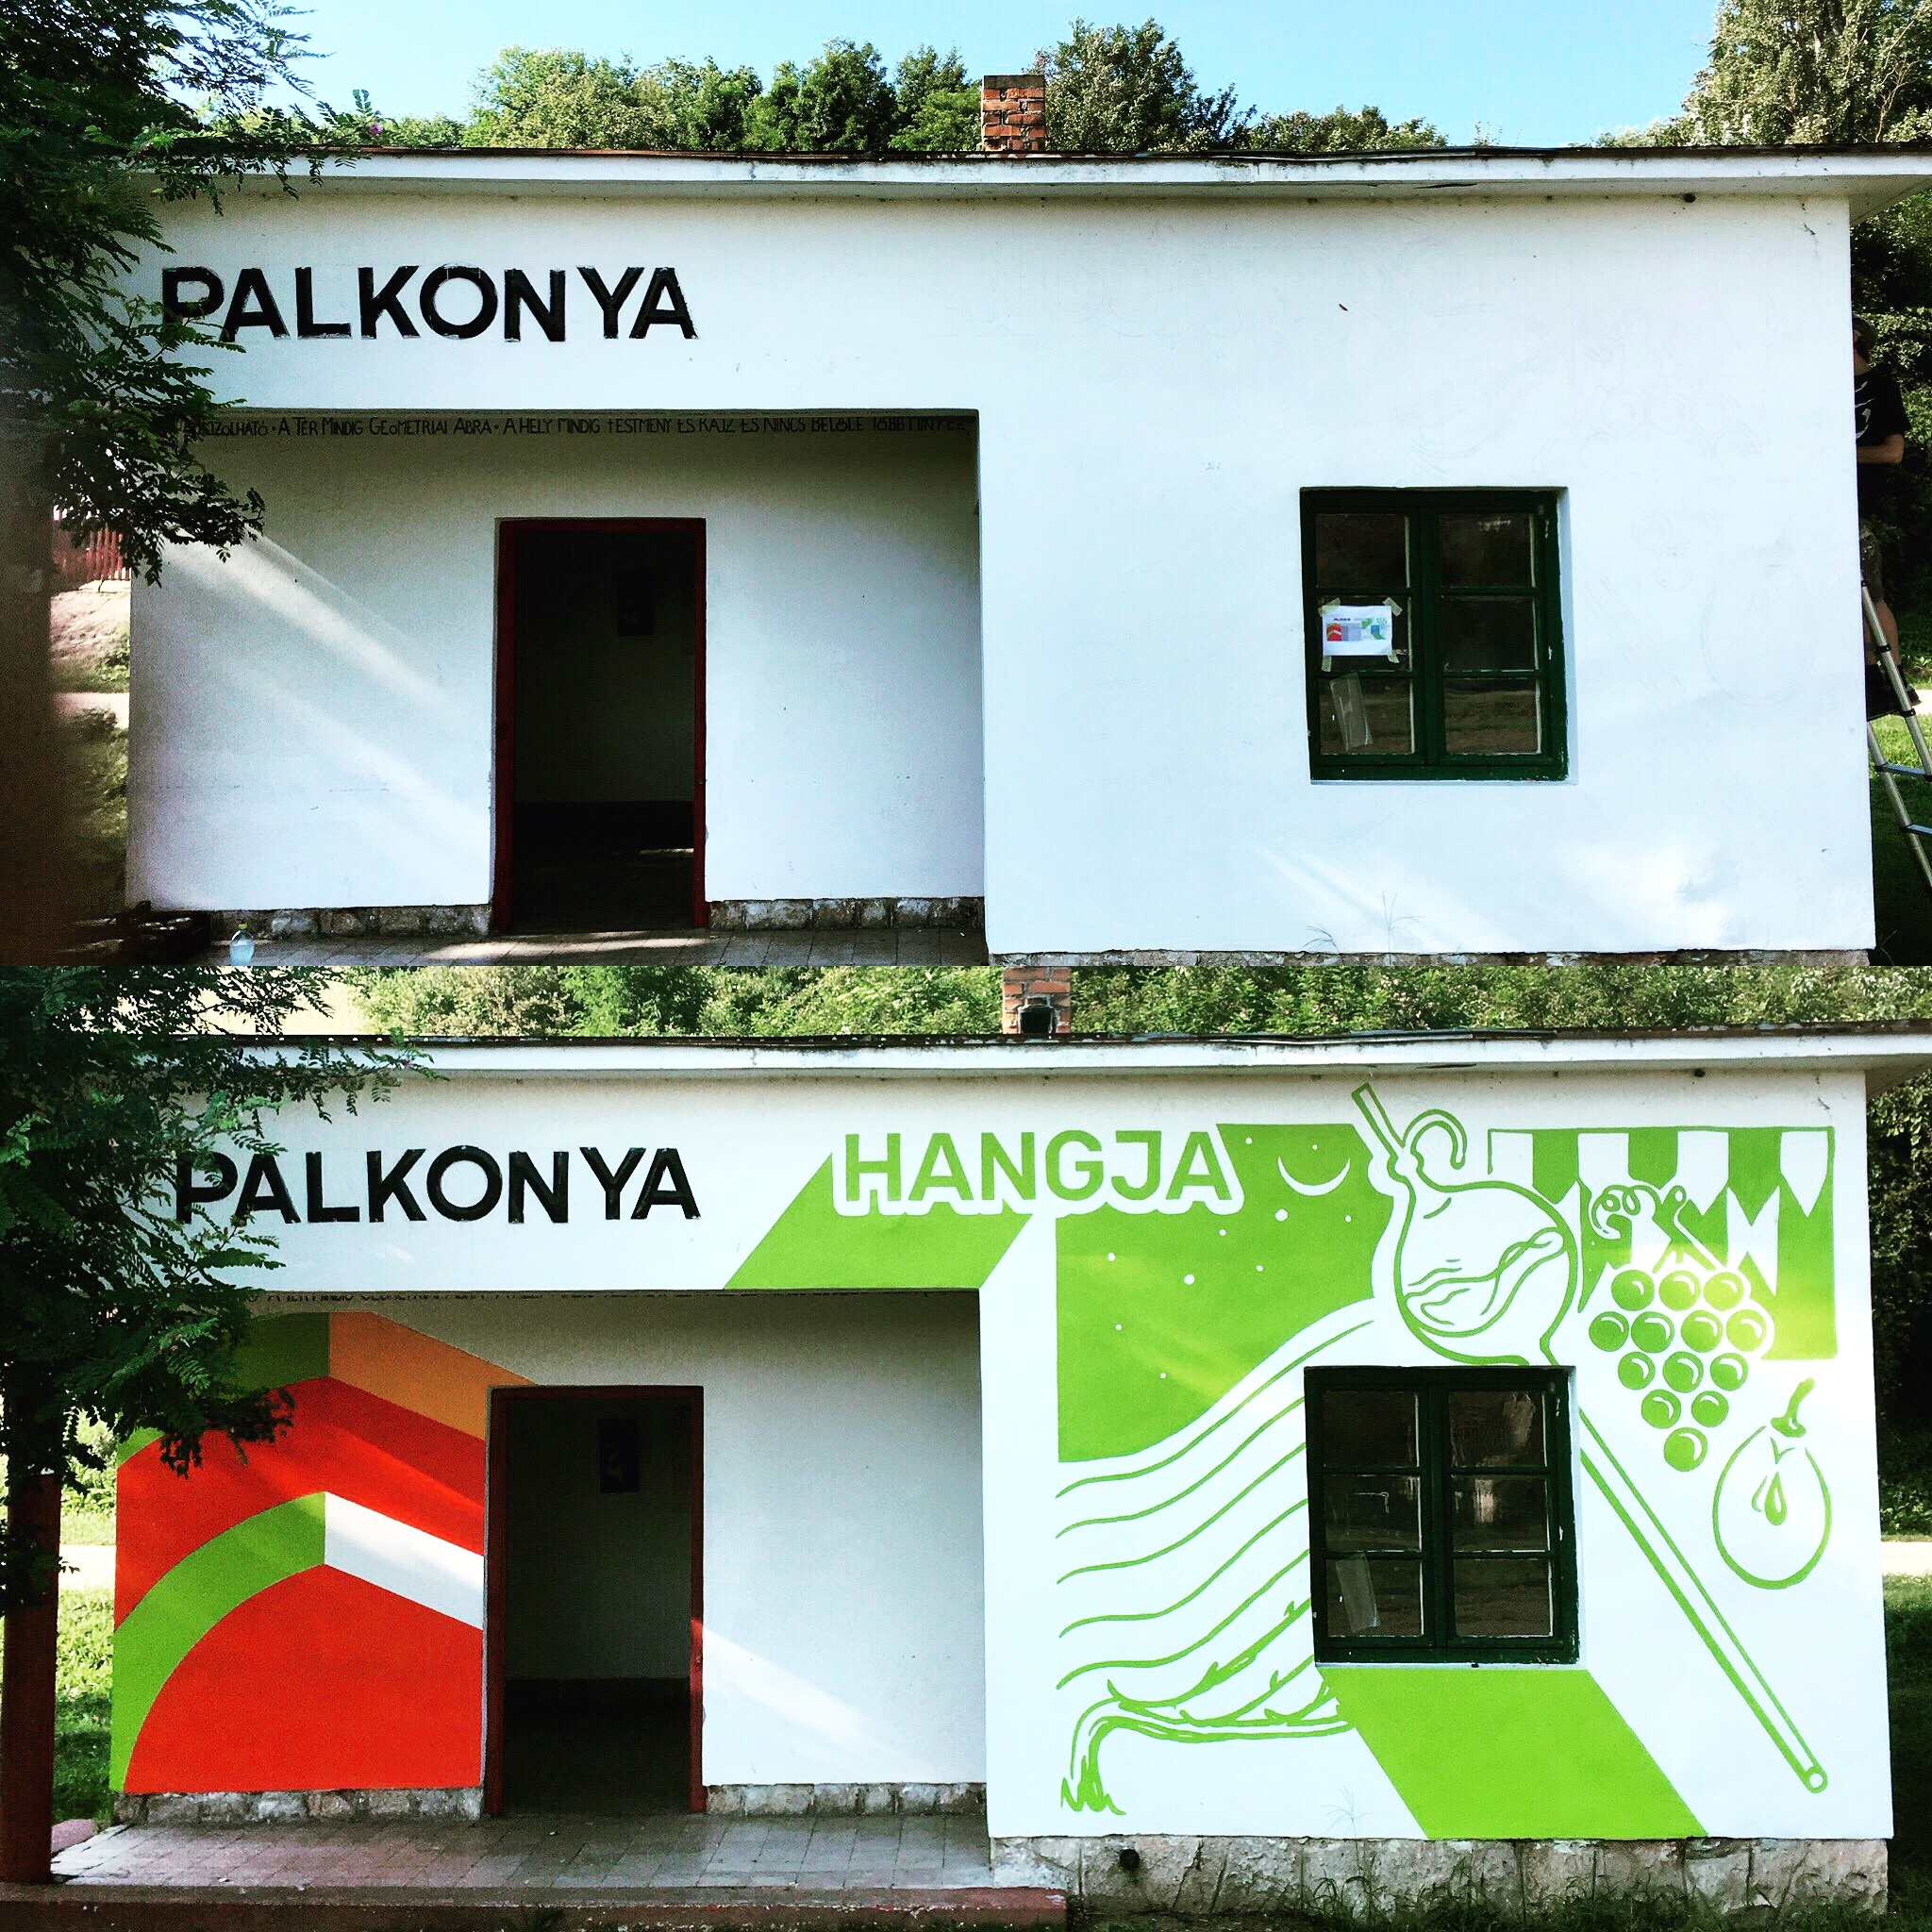 palkonya hangja vertigo murals dekorációs falfestés tűzfalfestés címfestés falfestmény